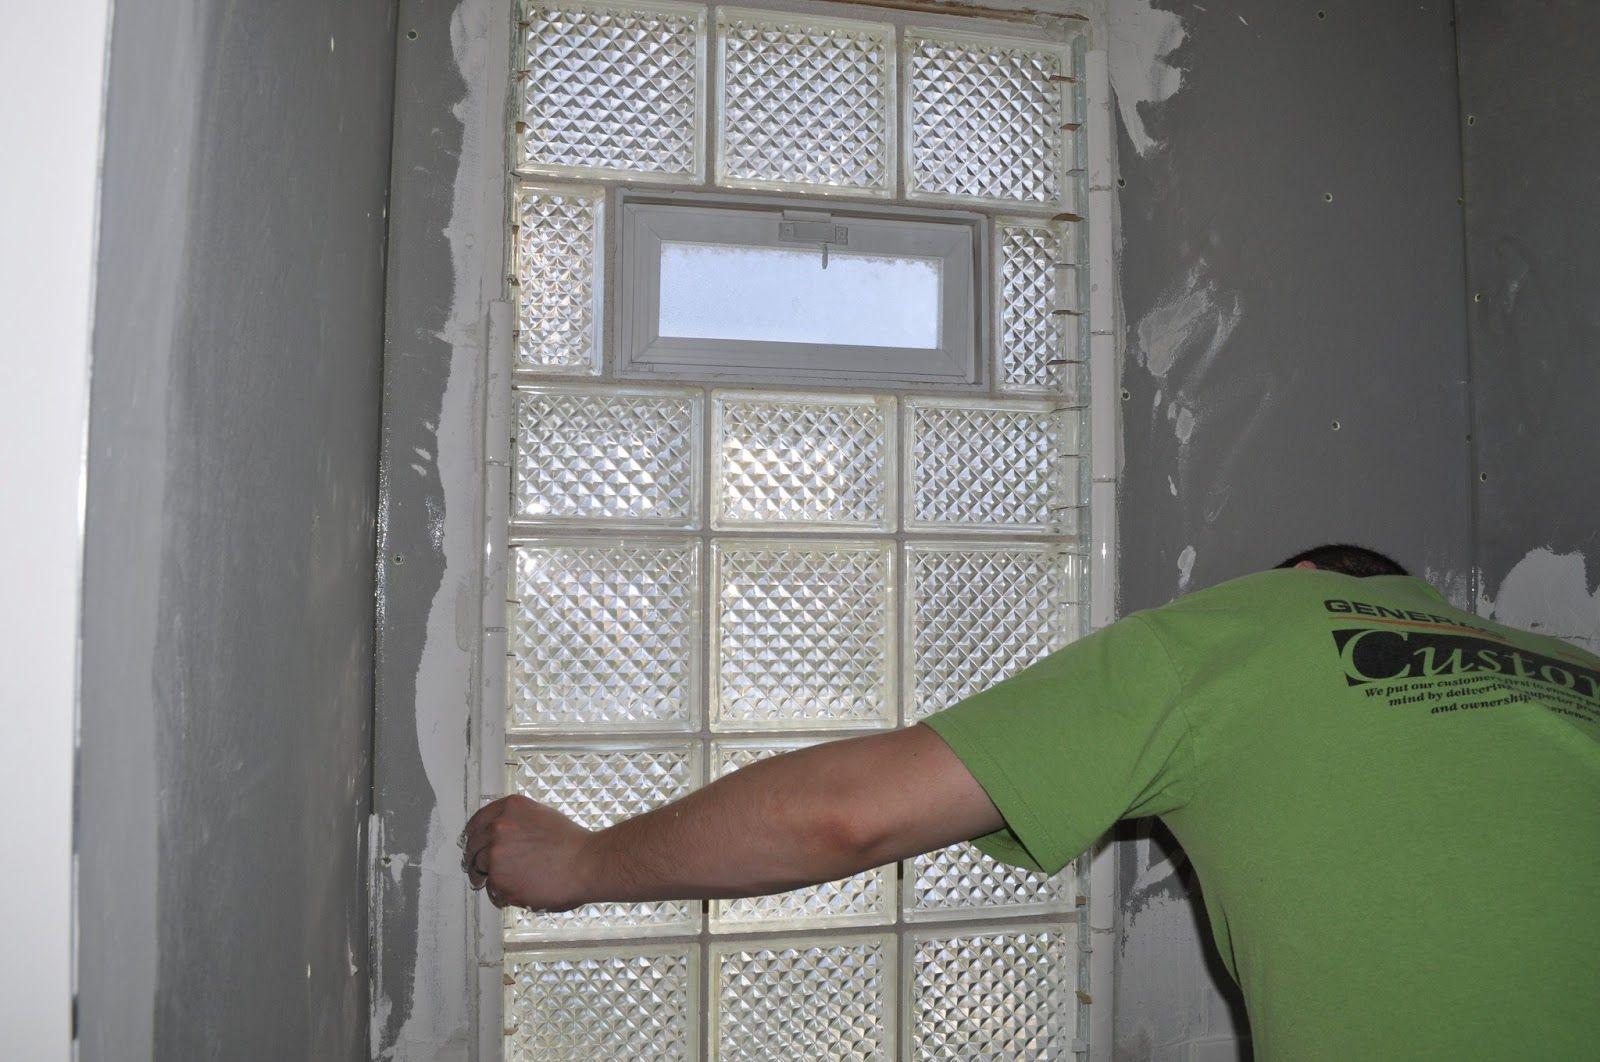 Bathroom Tile Love Glass Block Windows Bathrooms Remodel Window Vents